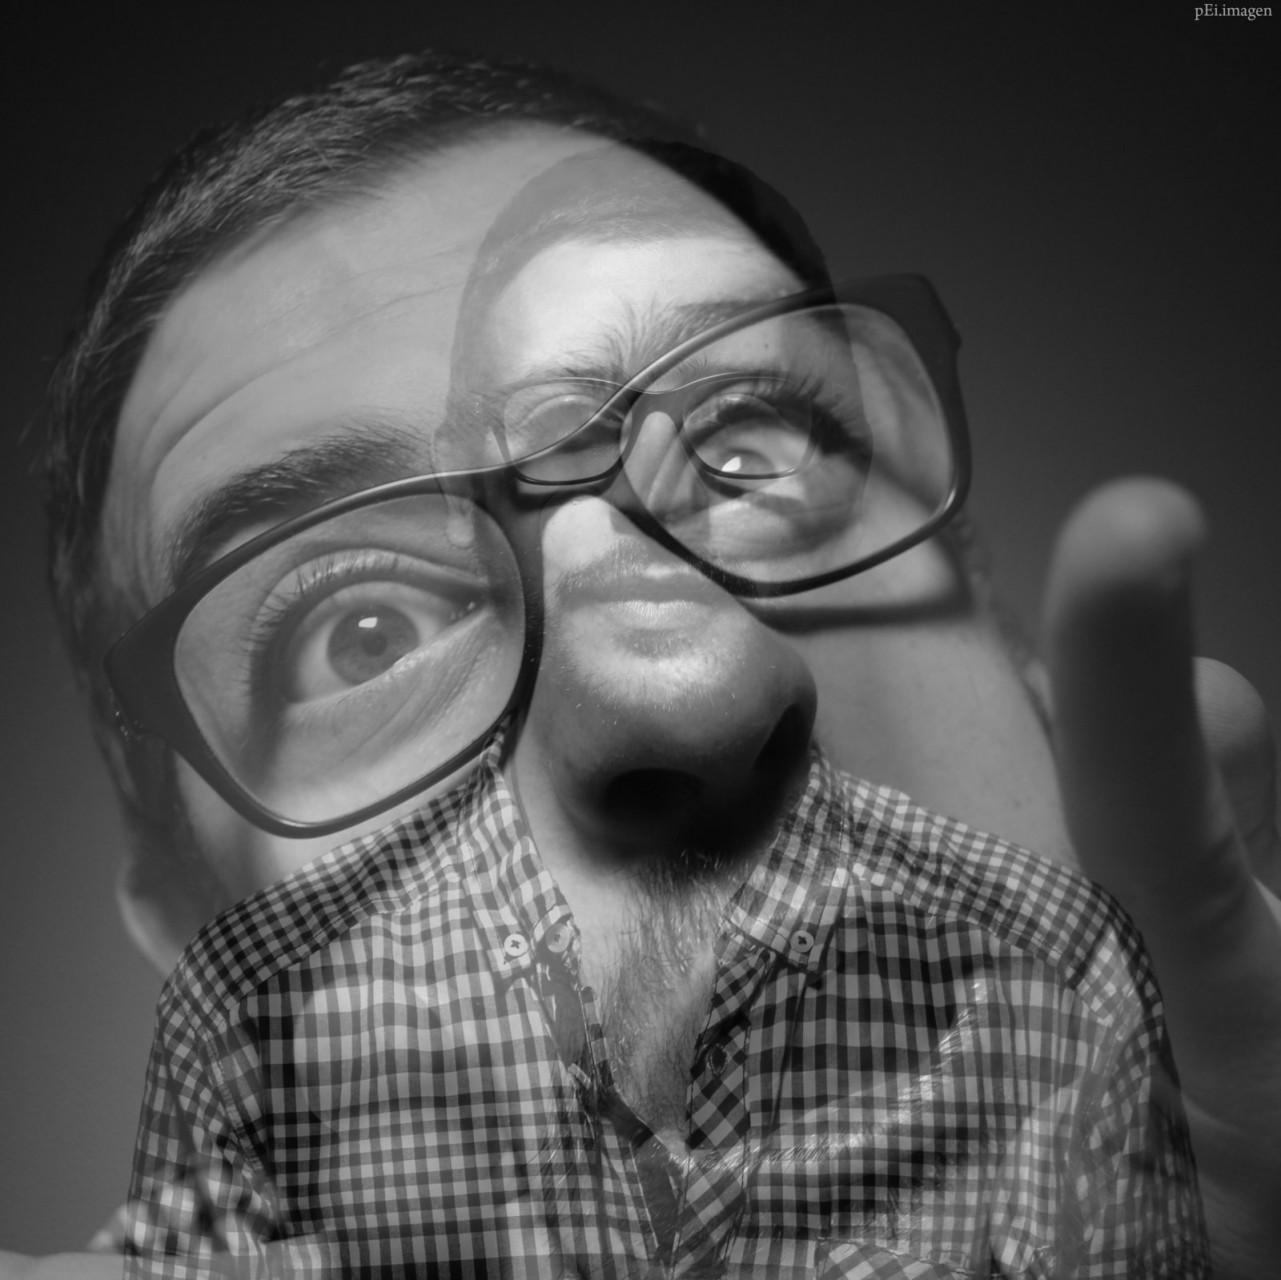 peipegata me myself I projectos fotografia peipegatafotografia # 010 Hector Rodriguez Crespo